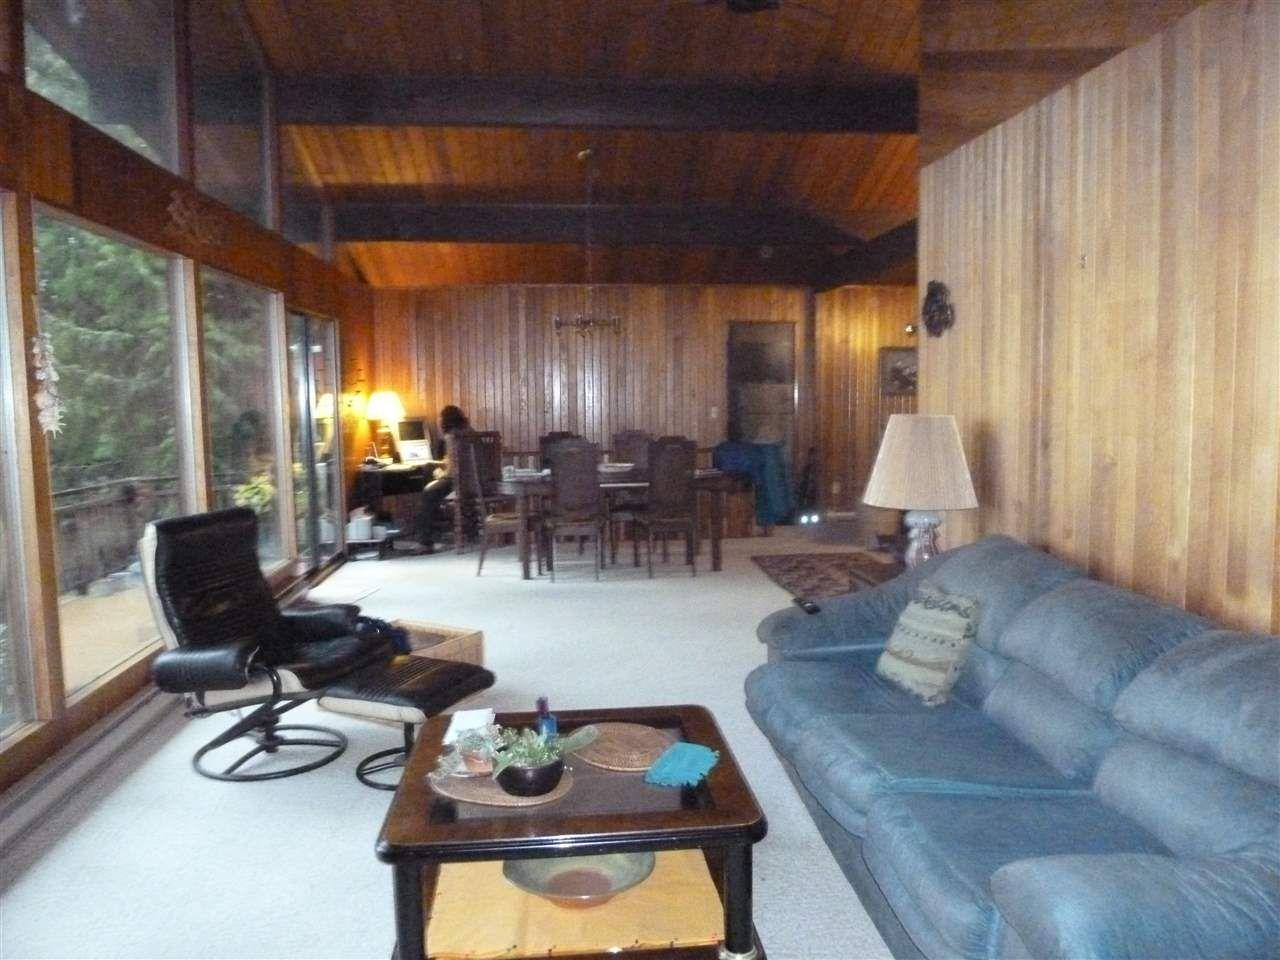 Photo 5: Photos: 5912 DEERHORN Drive in Sechelt: Sechelt District House for sale (Sunshine Coast)  : MLS®# R2118567